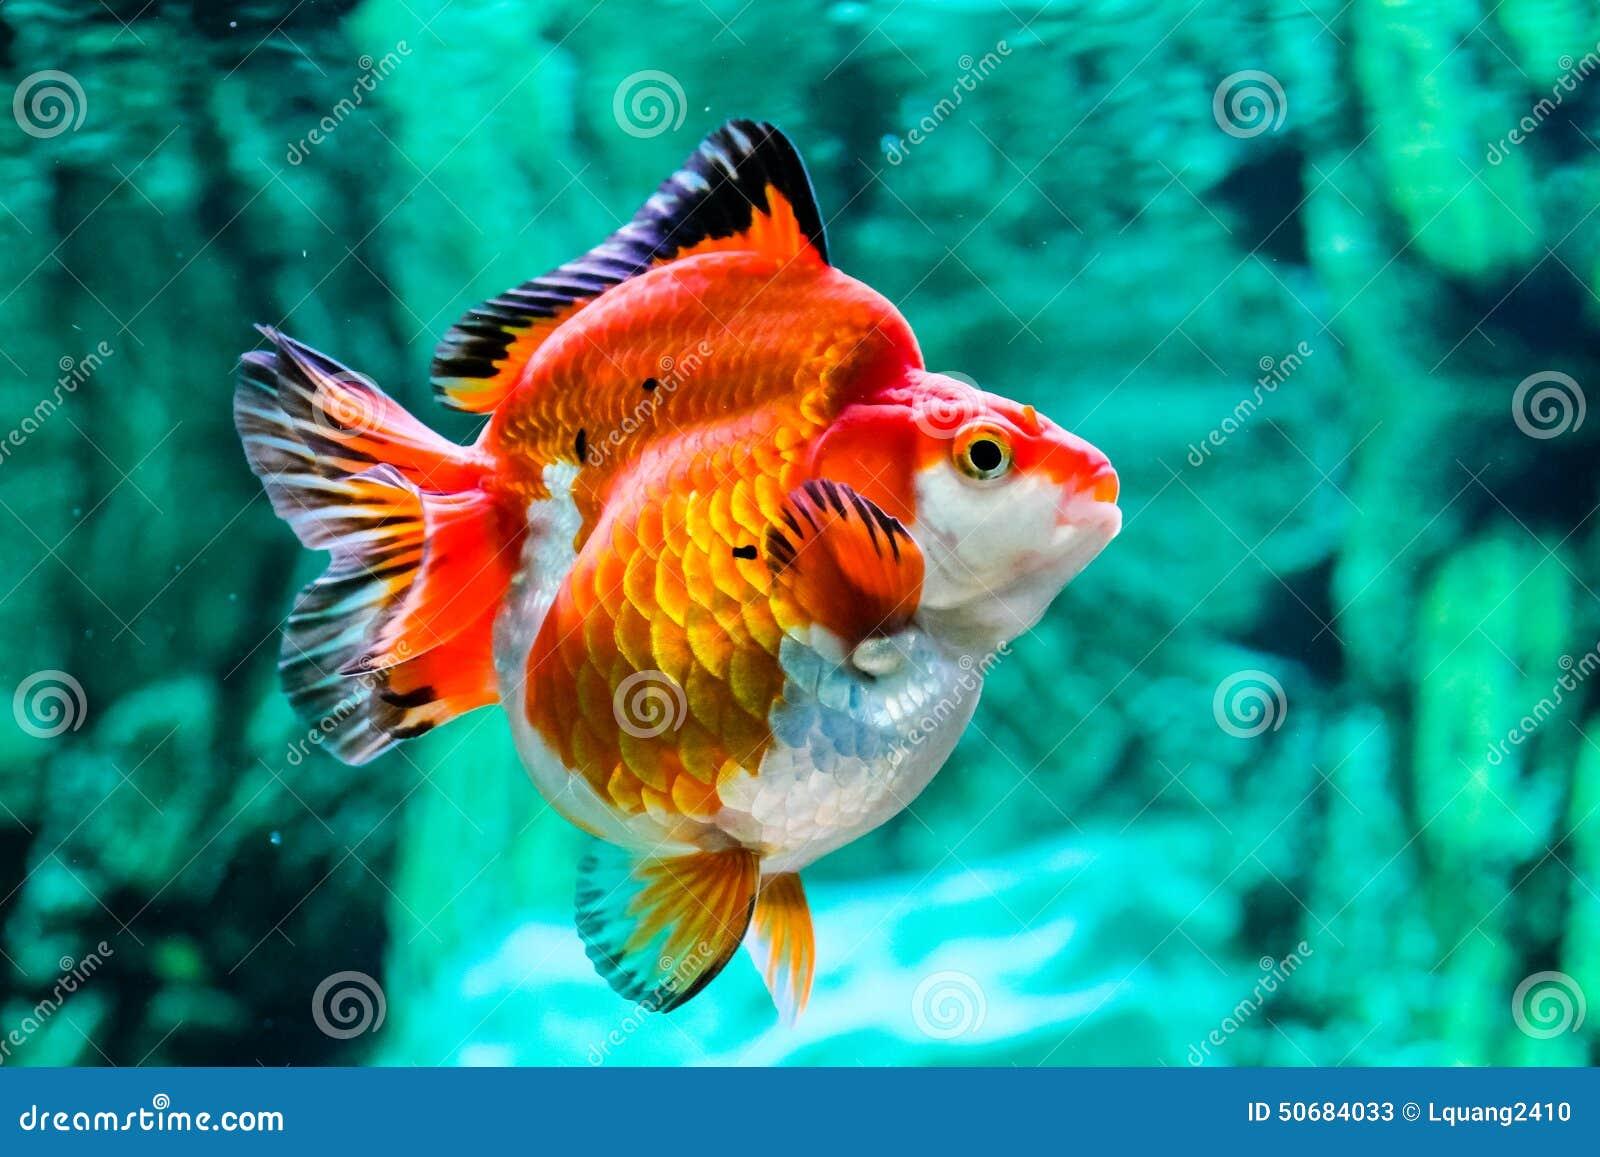 Download 关闭在水族馆的金鱼 库存图片. 图片 包括有 关闭, 弯脚的, 红色, 概念性, 水生, 颜色, 金黄, 本质 - 50684033